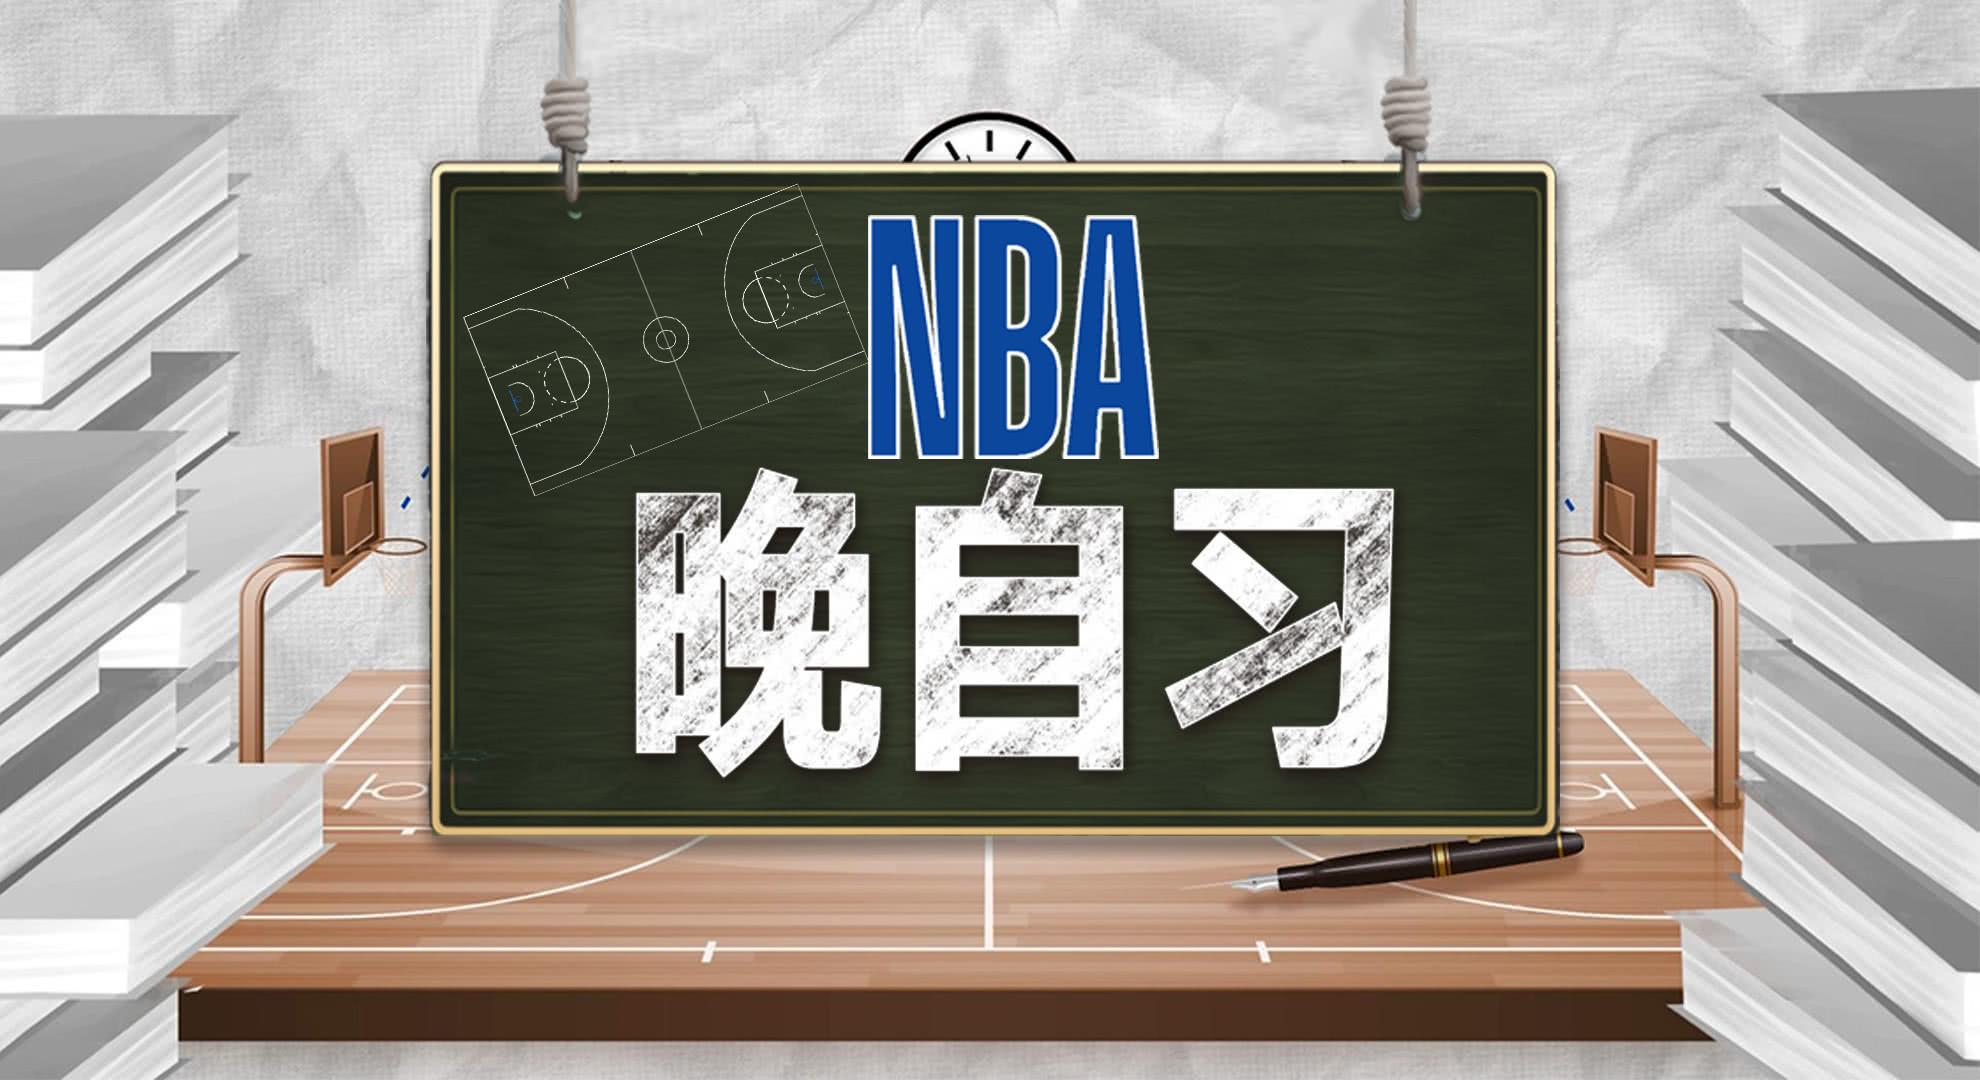 【NBA晚自习】乐福实名diss老队友,主力球衣退役为何独缺JR_NBA晚自习